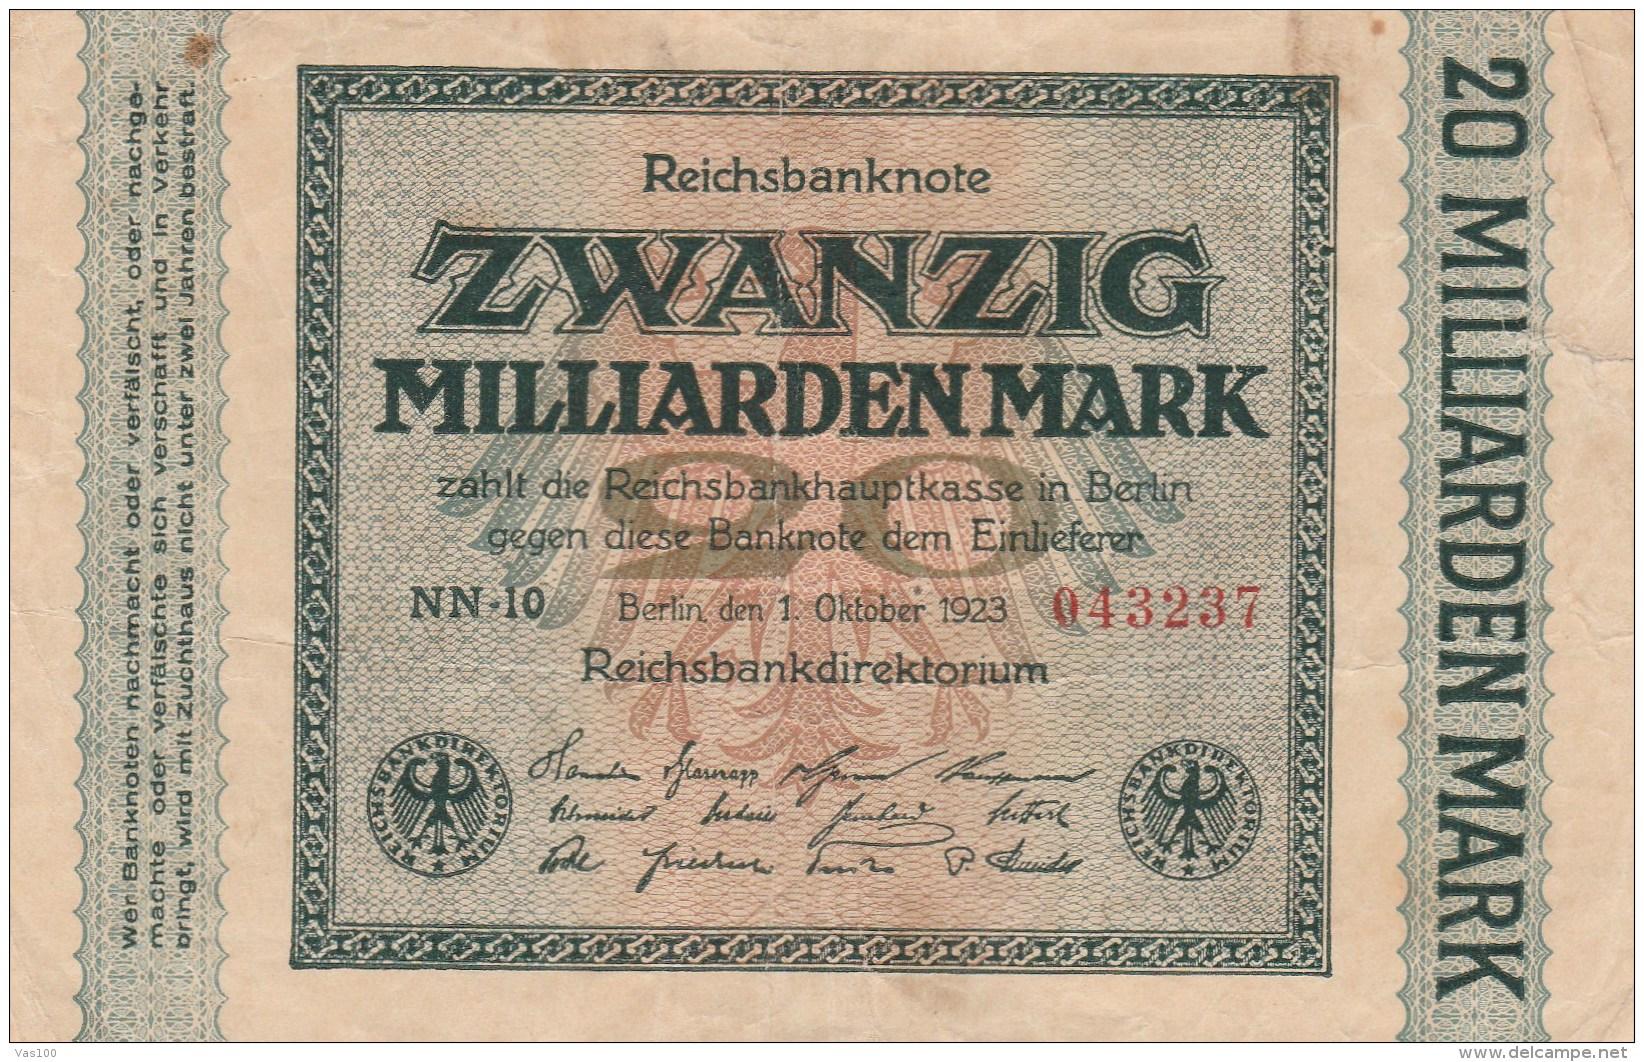 20 MILLIARDEN MARK, REICHSBANKNOTE, 1923, PAPER BANKNOTE, GERMANY. - 20 Milliarden Mark